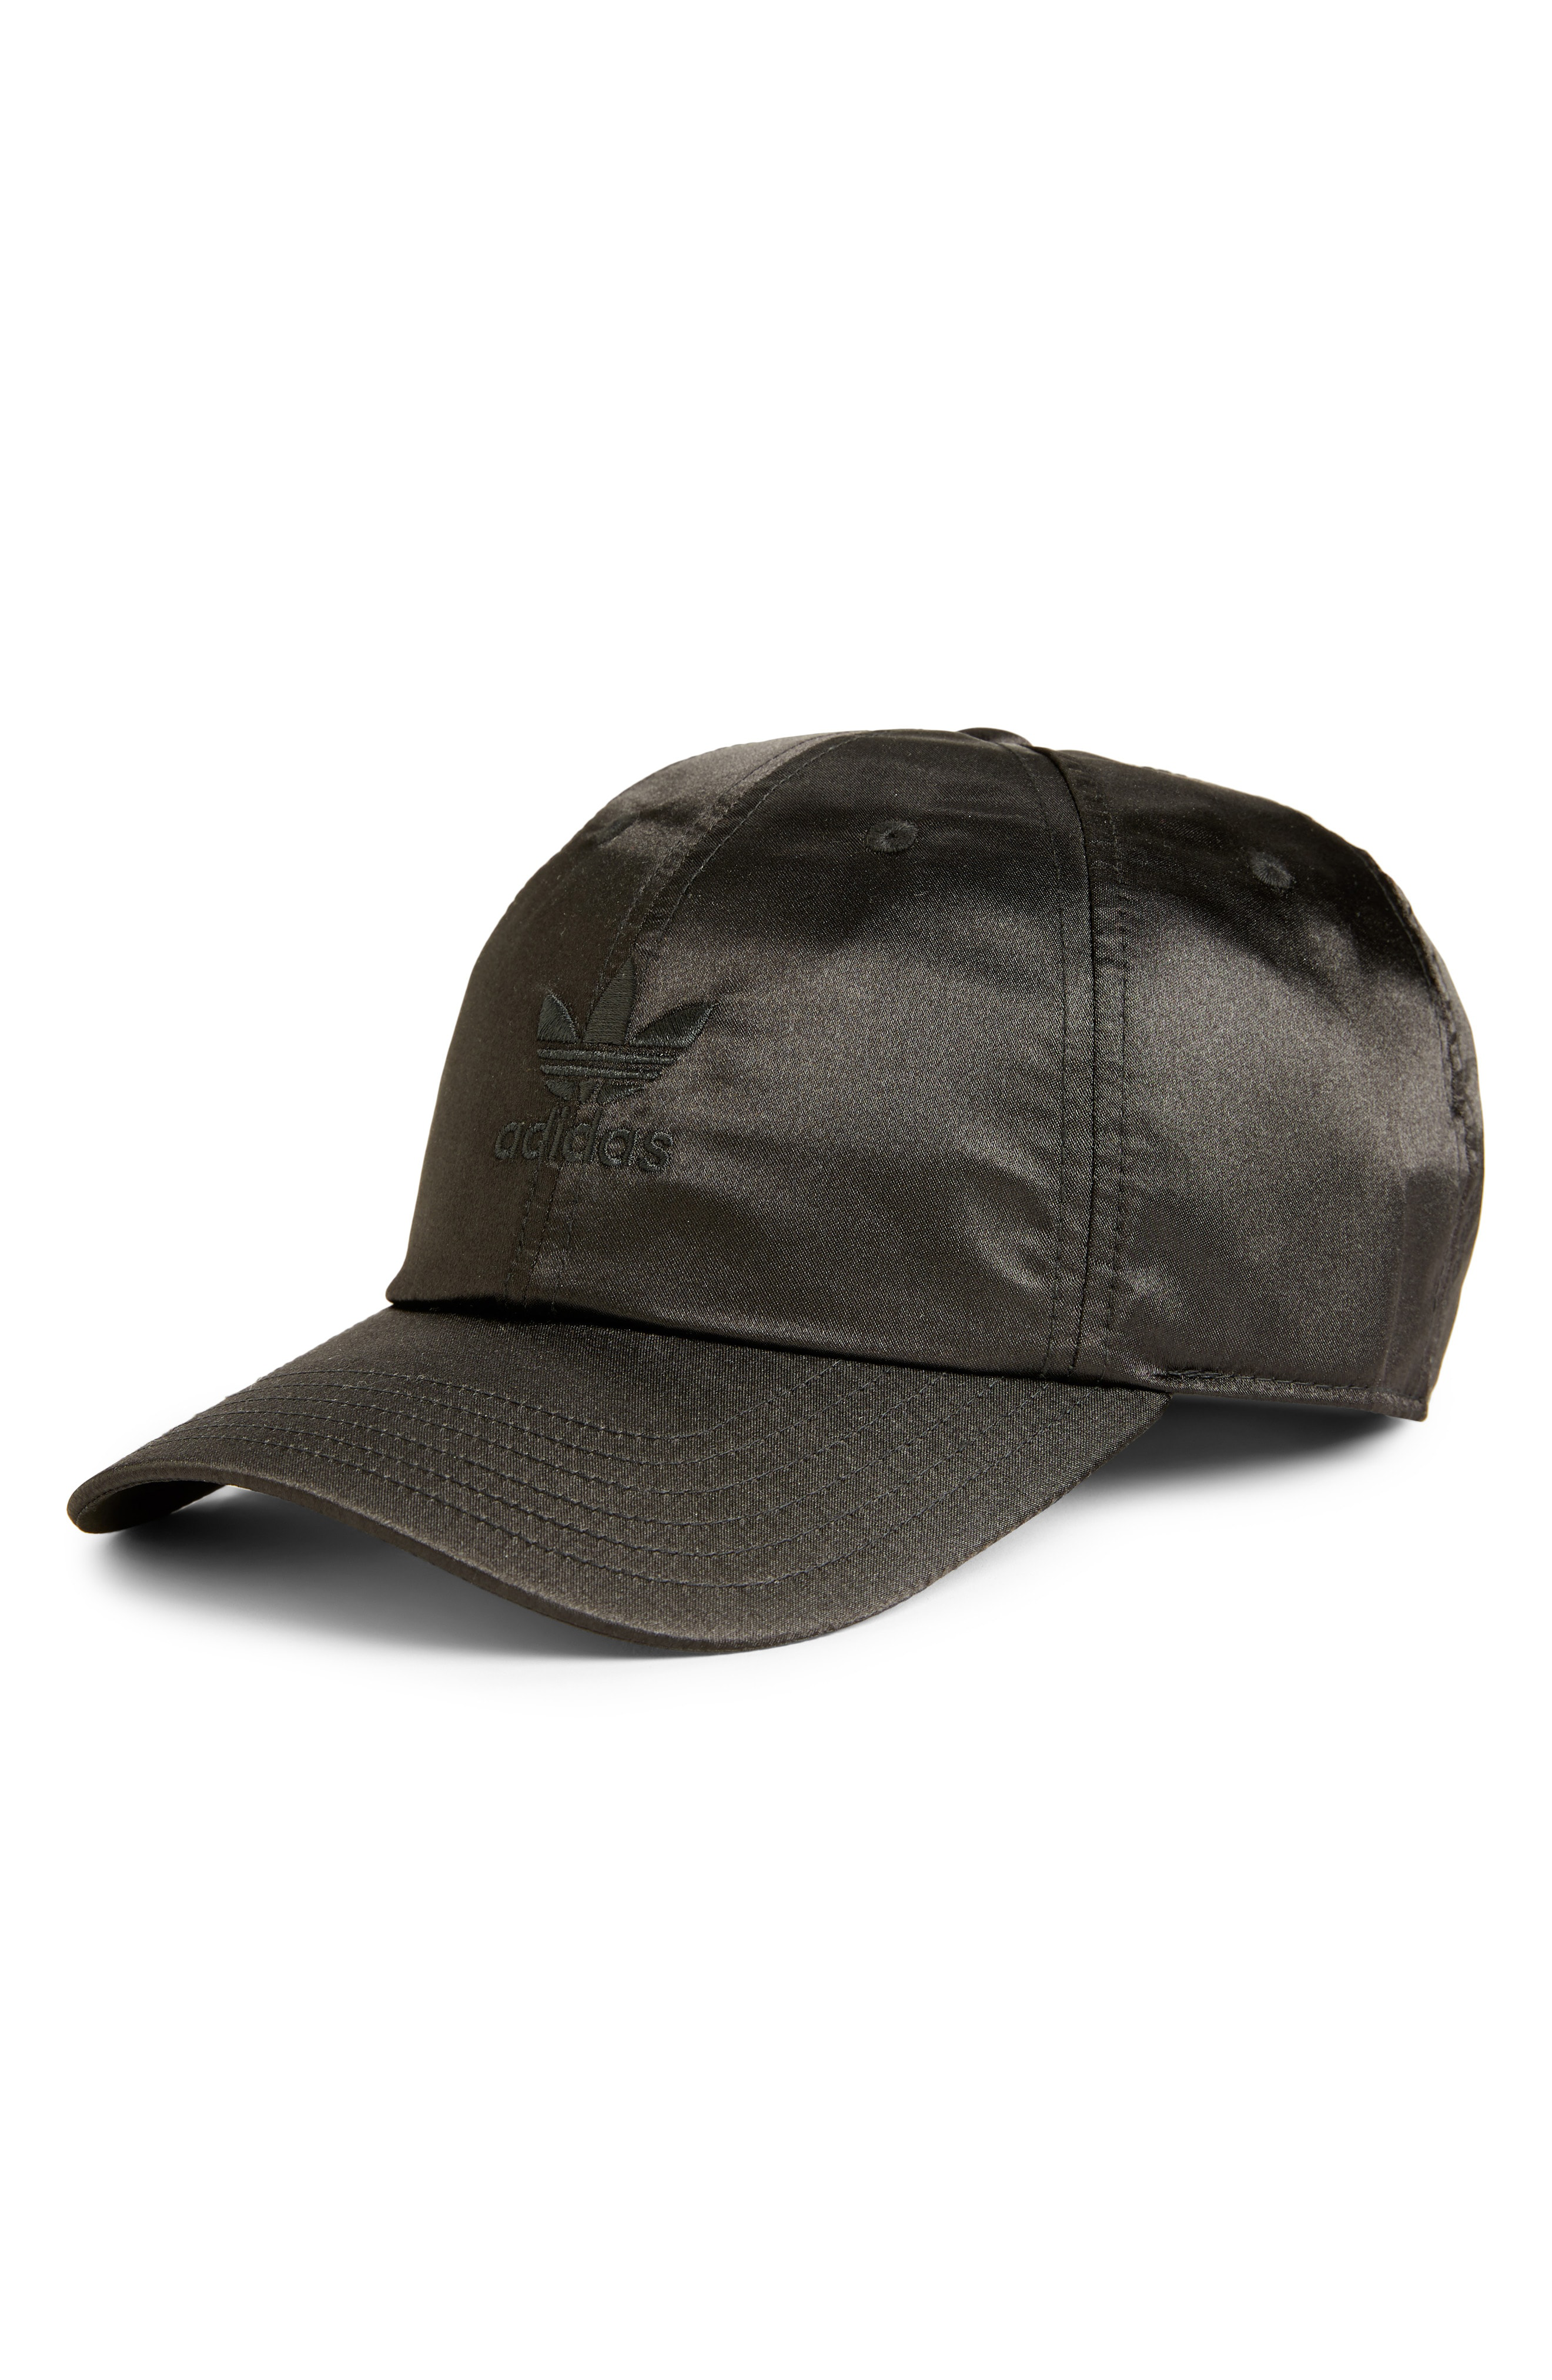 35e84812c9548 Adidas Originals Women s Originals Satin Adjustable Back Hat